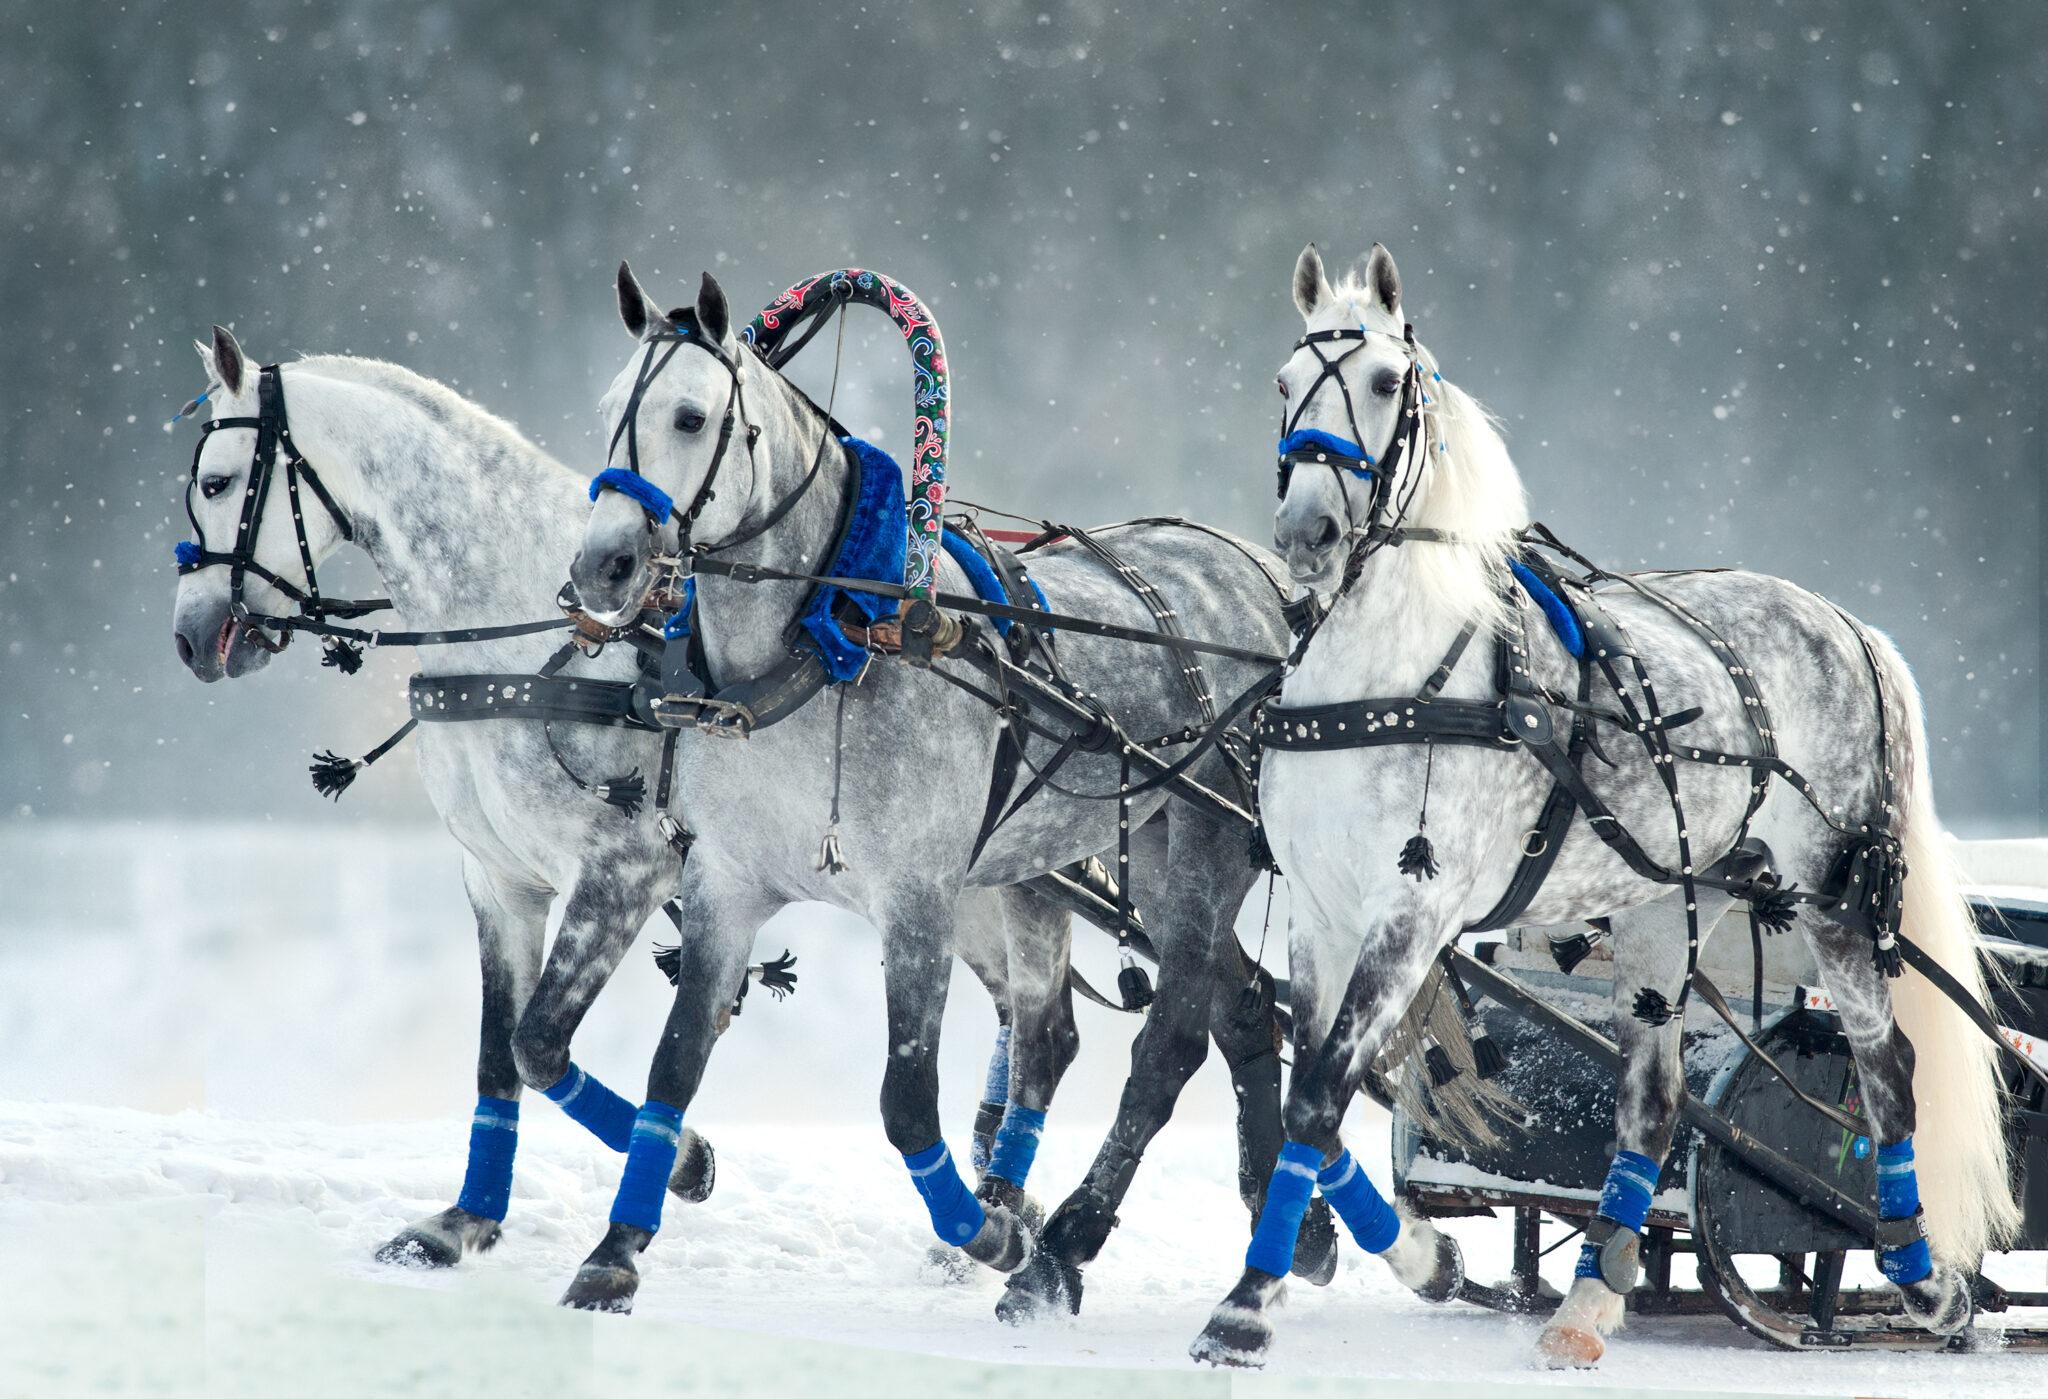 Horse Breed: Orlov Trotter - photo by Olga_i / Shutterstock.com - Globetrotting horse riding holidays